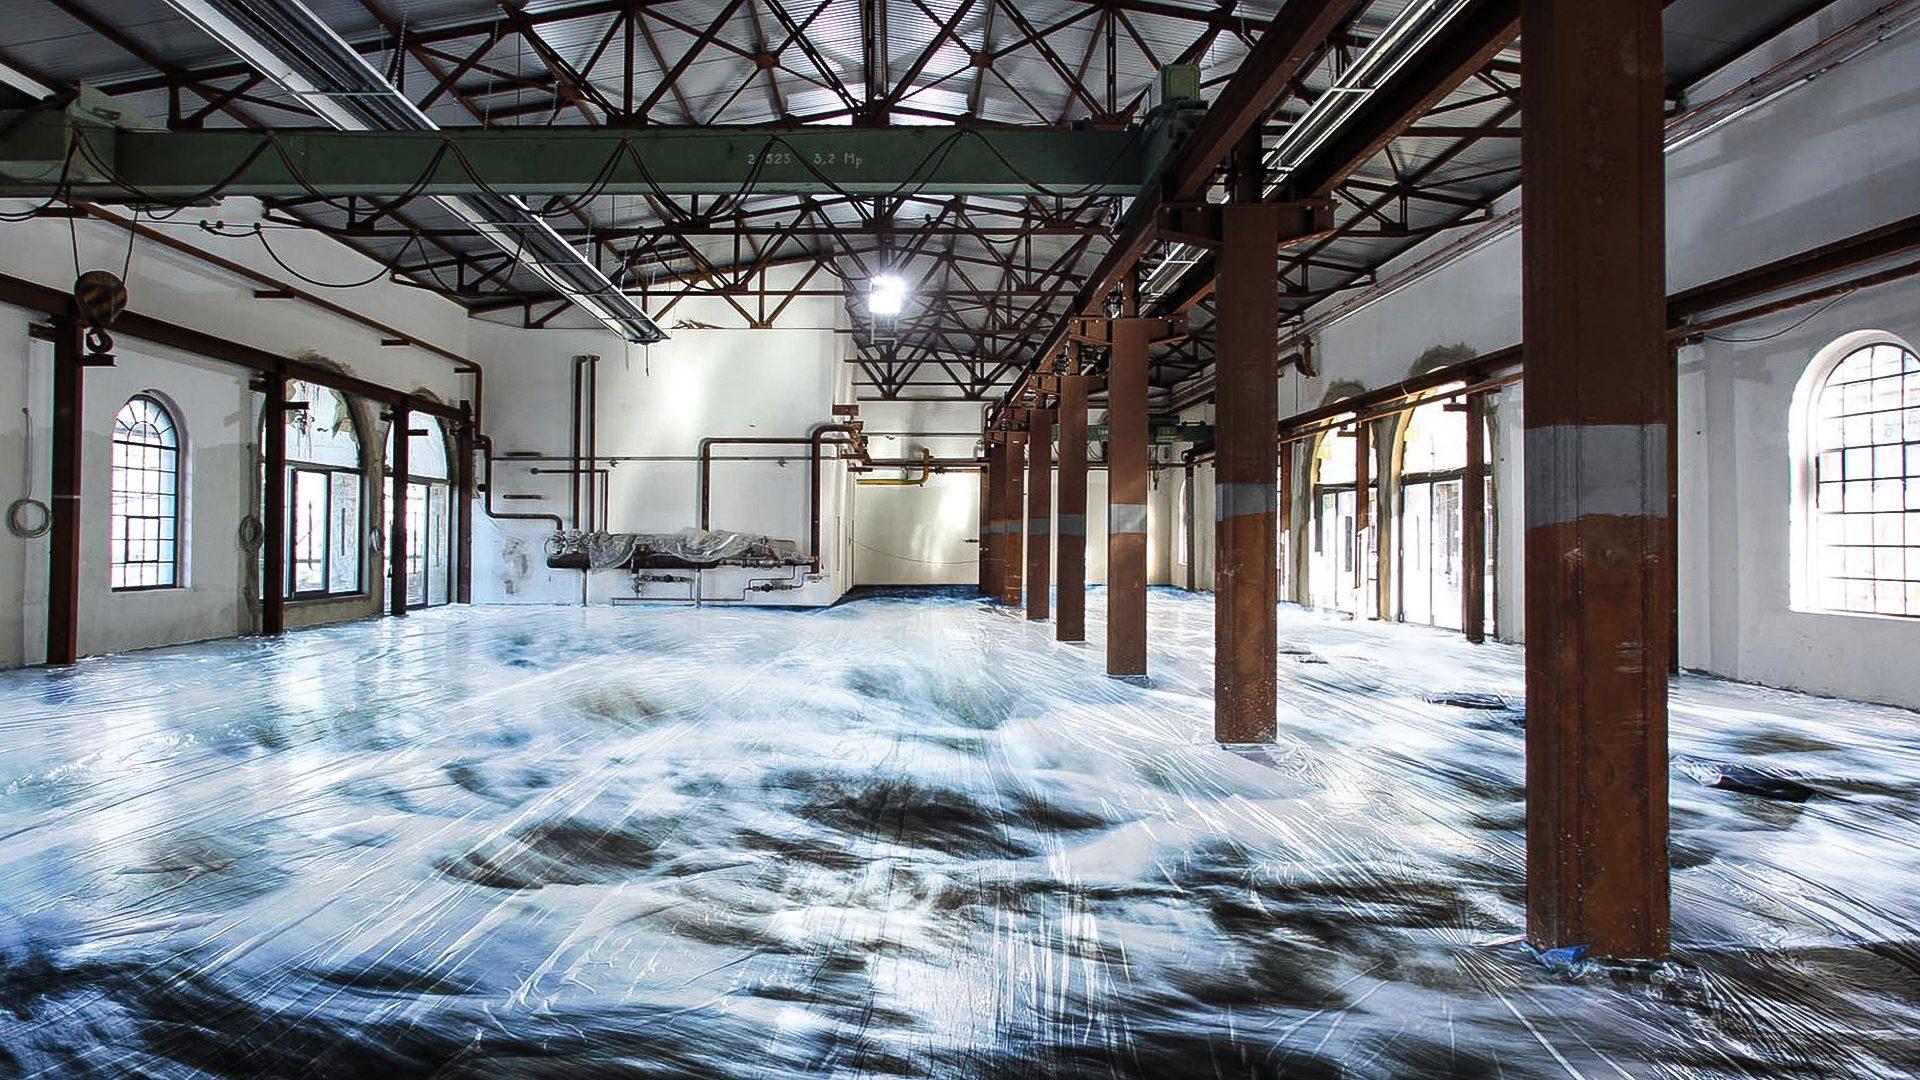 3D floor projection in an art gallery